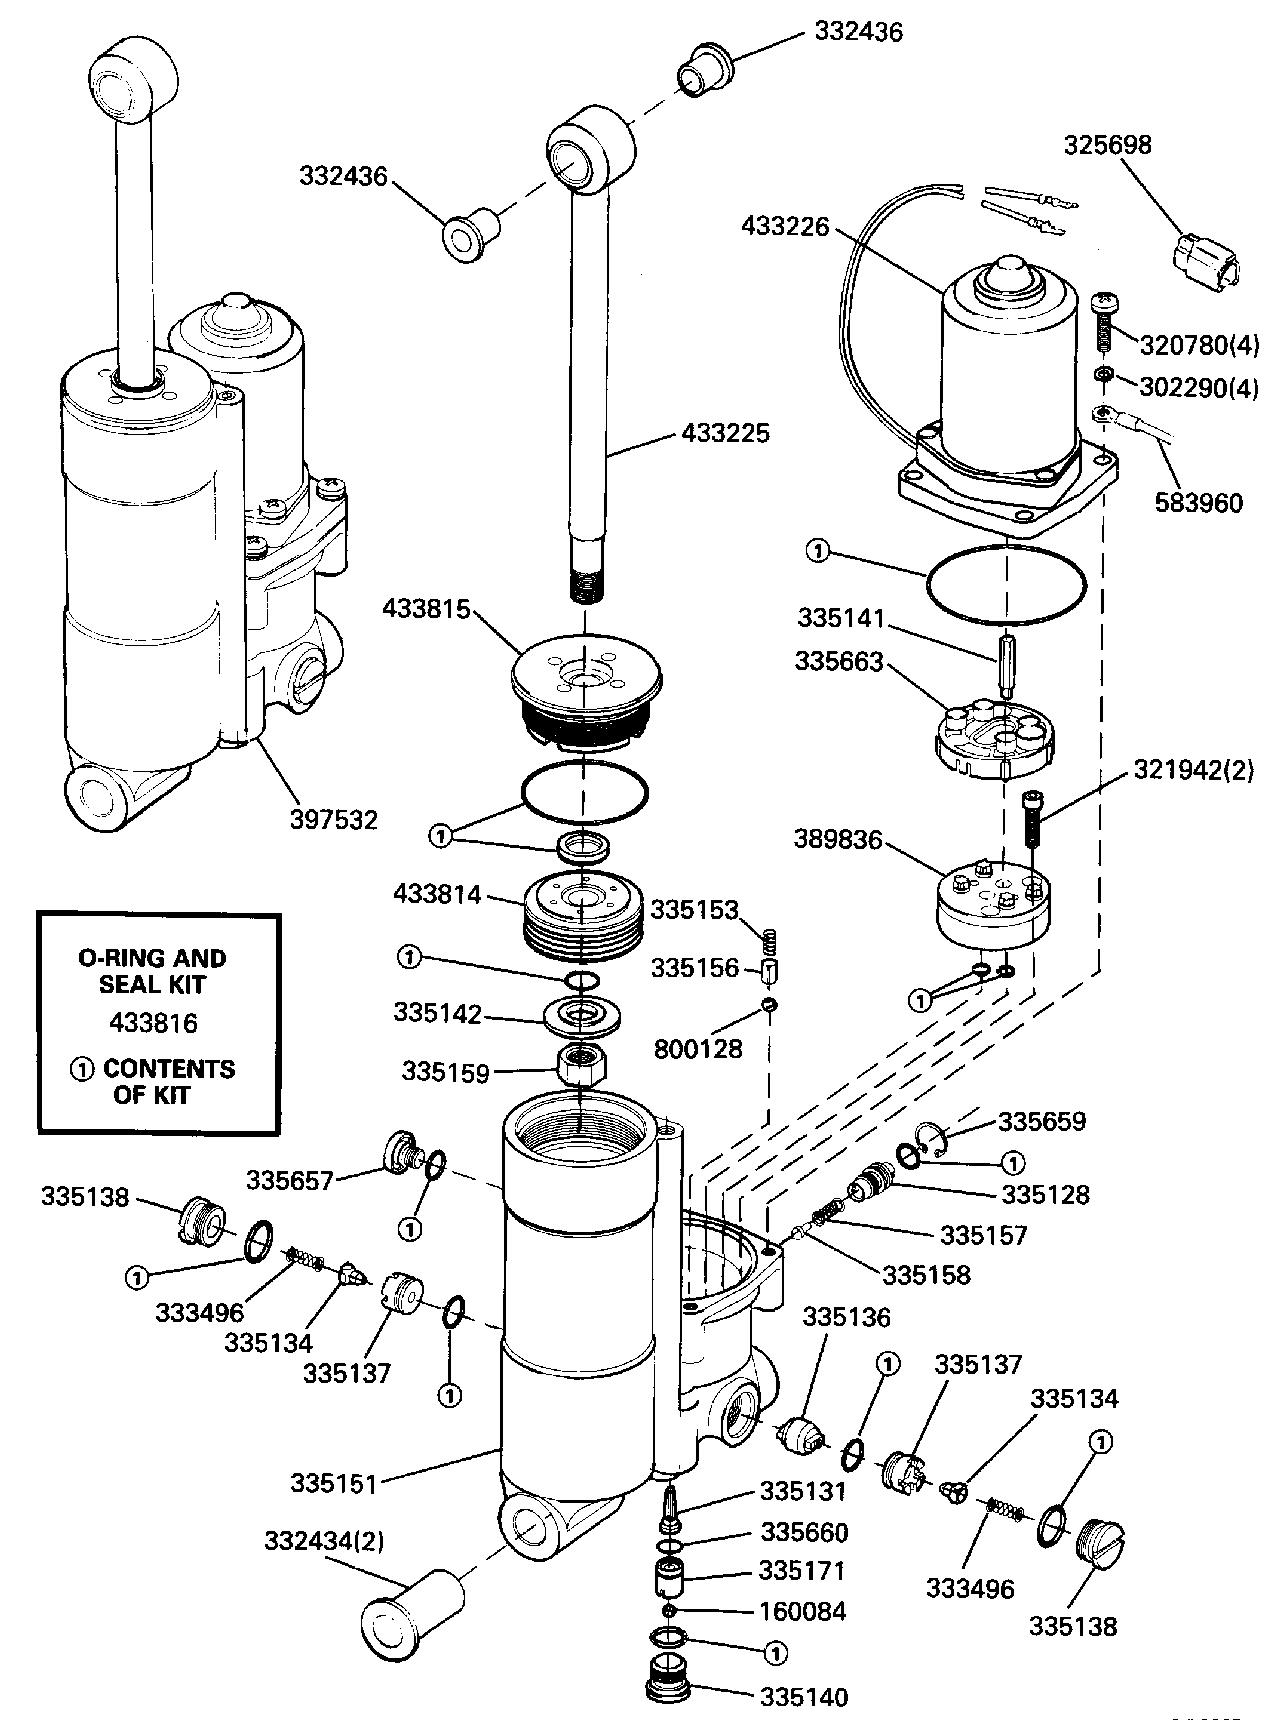 hight resolution of brp johnson en 1989 40 j40ecec 1989 power tilt trim